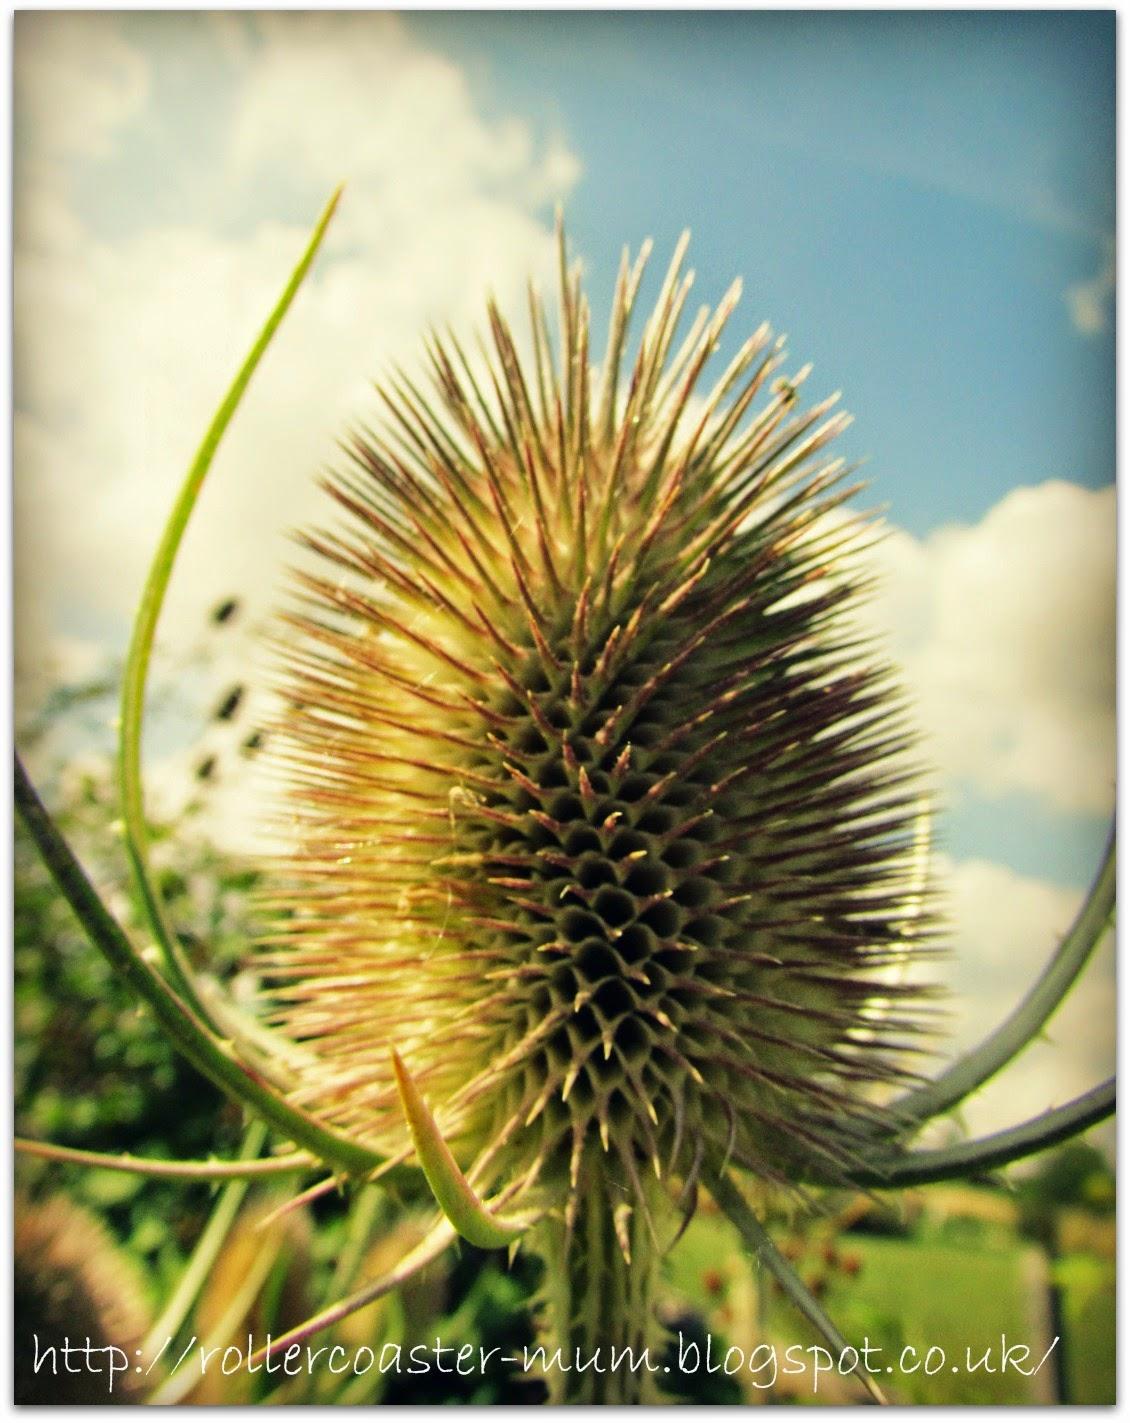 Dipsacus, Teasel flower